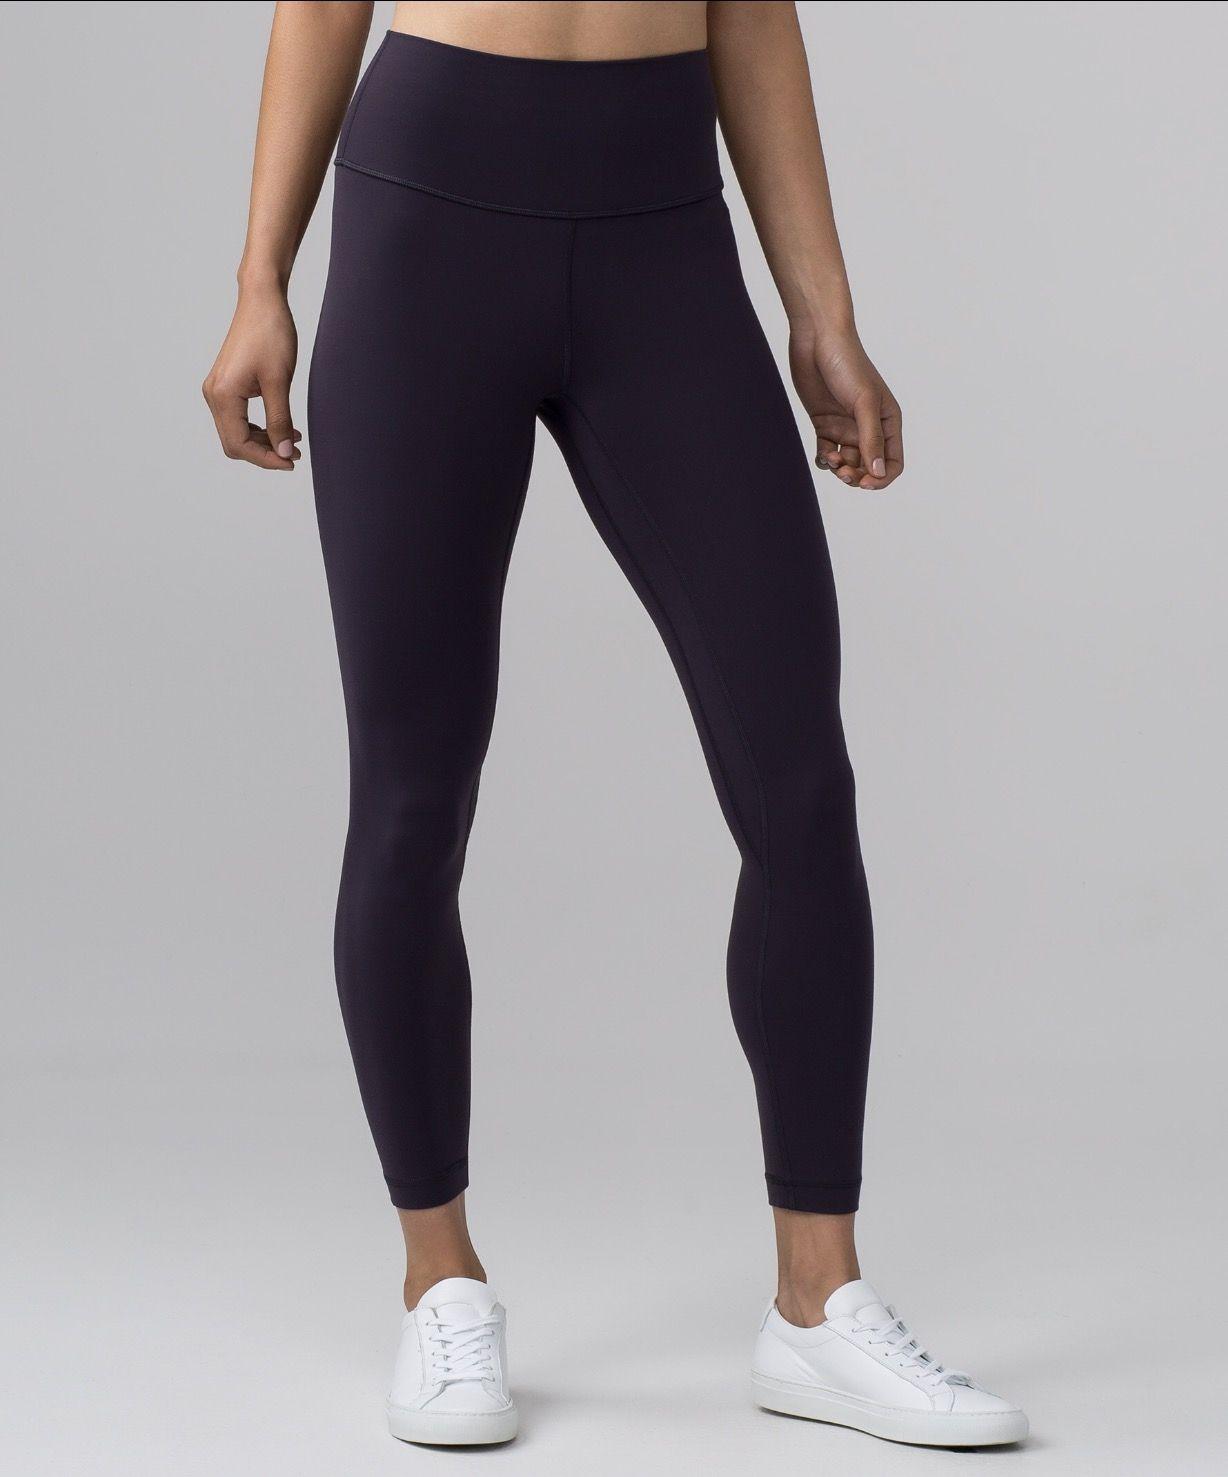 35d4850a2bb409 Boysenberry align pant II size 6 | Lululemon Pants and Crops | Pants ...